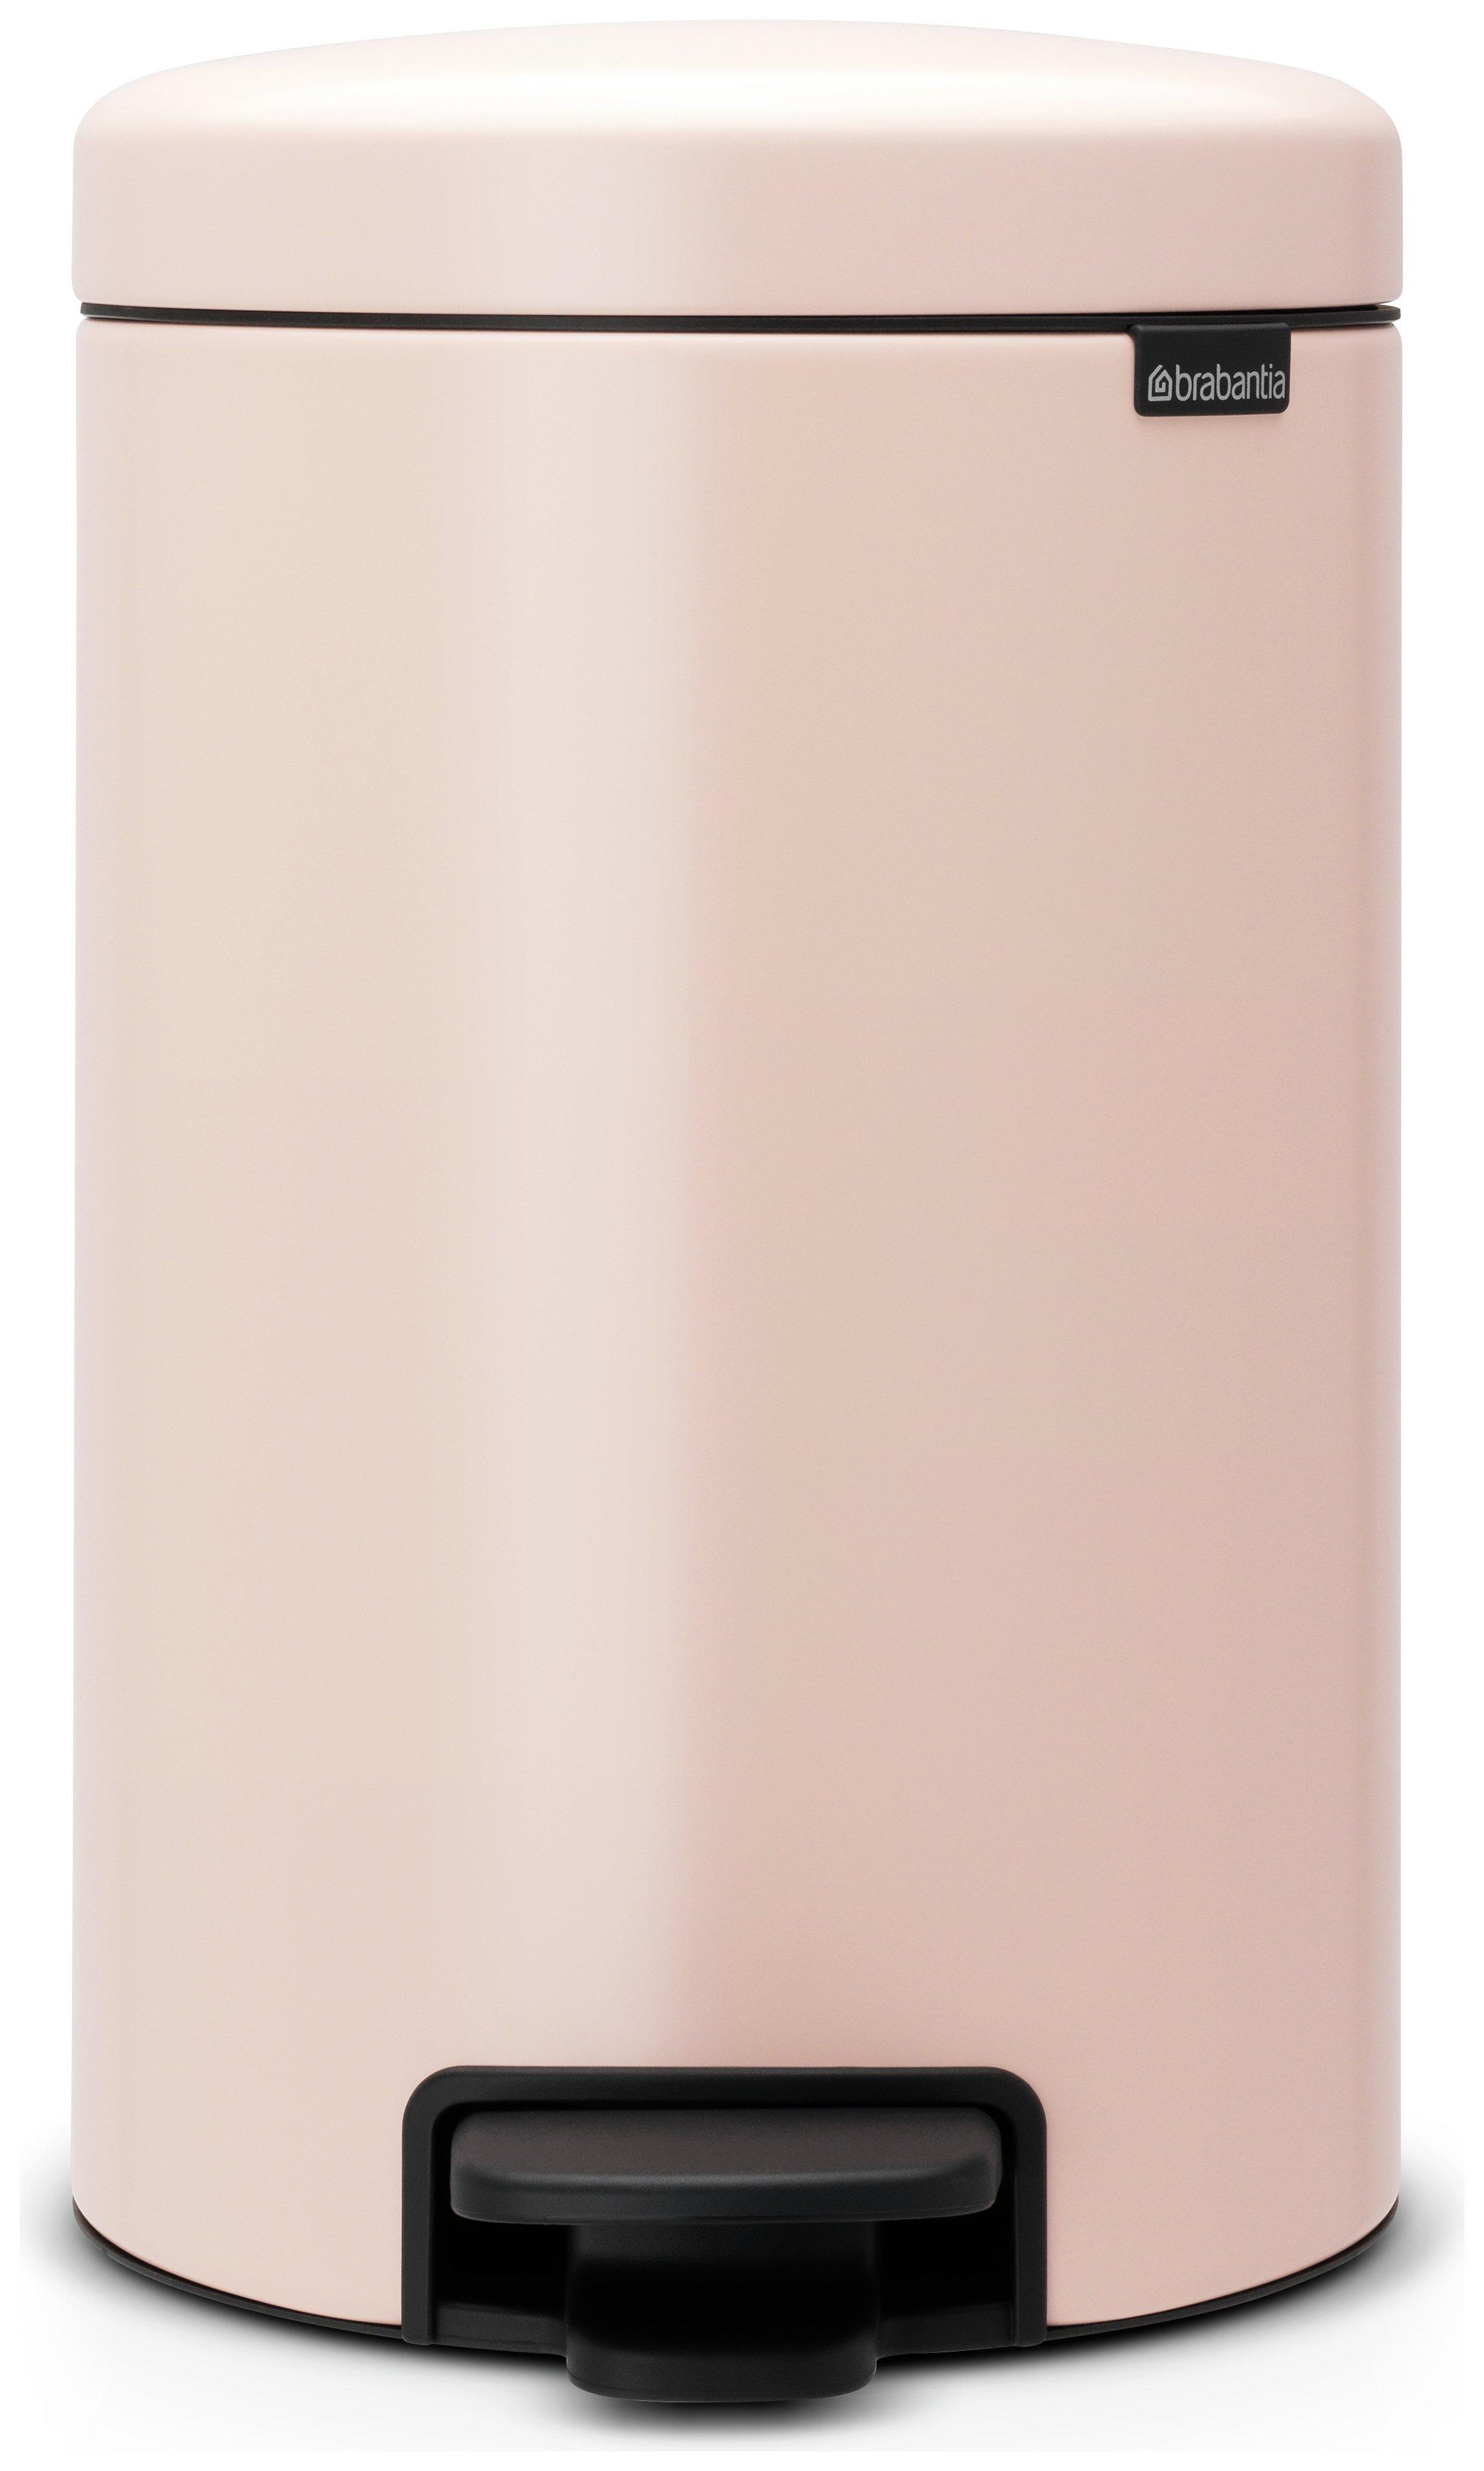 brabantia-newicon-12-litre-pedal-bin-pink